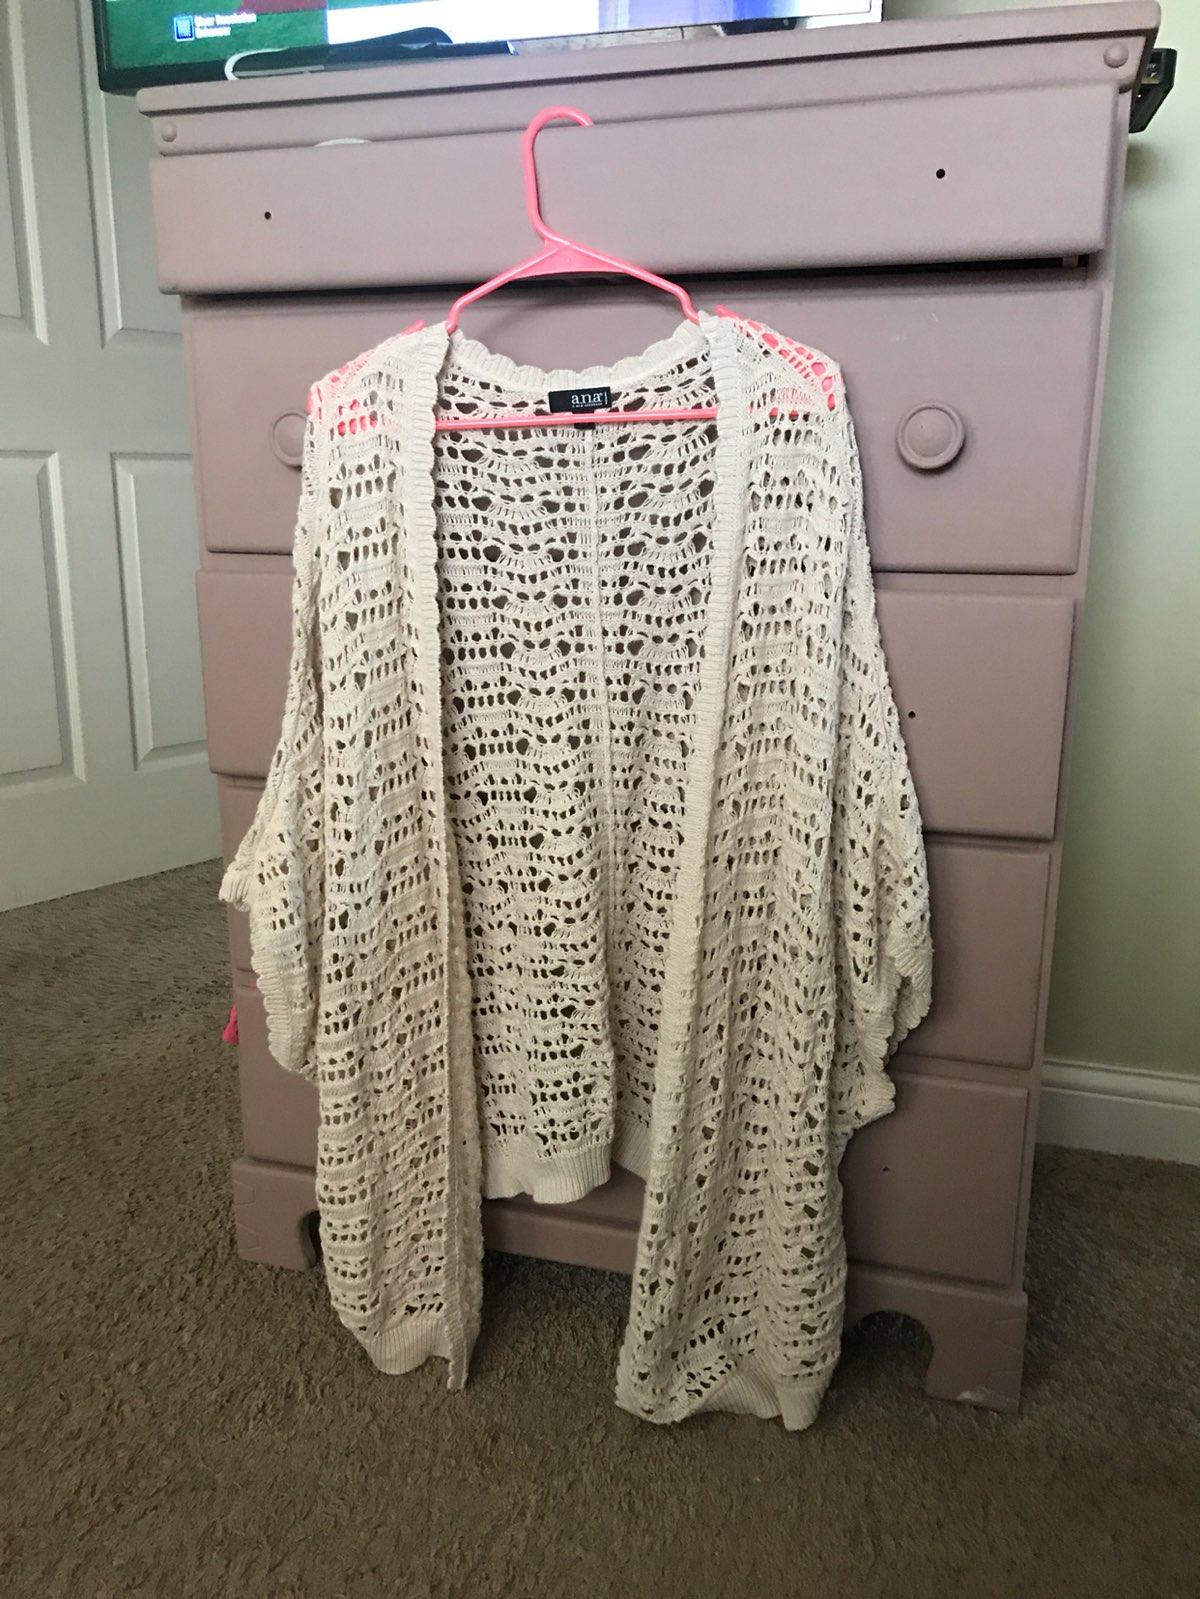 Oversized crochet cardigan 1x2x 18 plus mercari buy sell oversized crochet cardigan 1x2x 18 plus bankloansurffo Choice Image